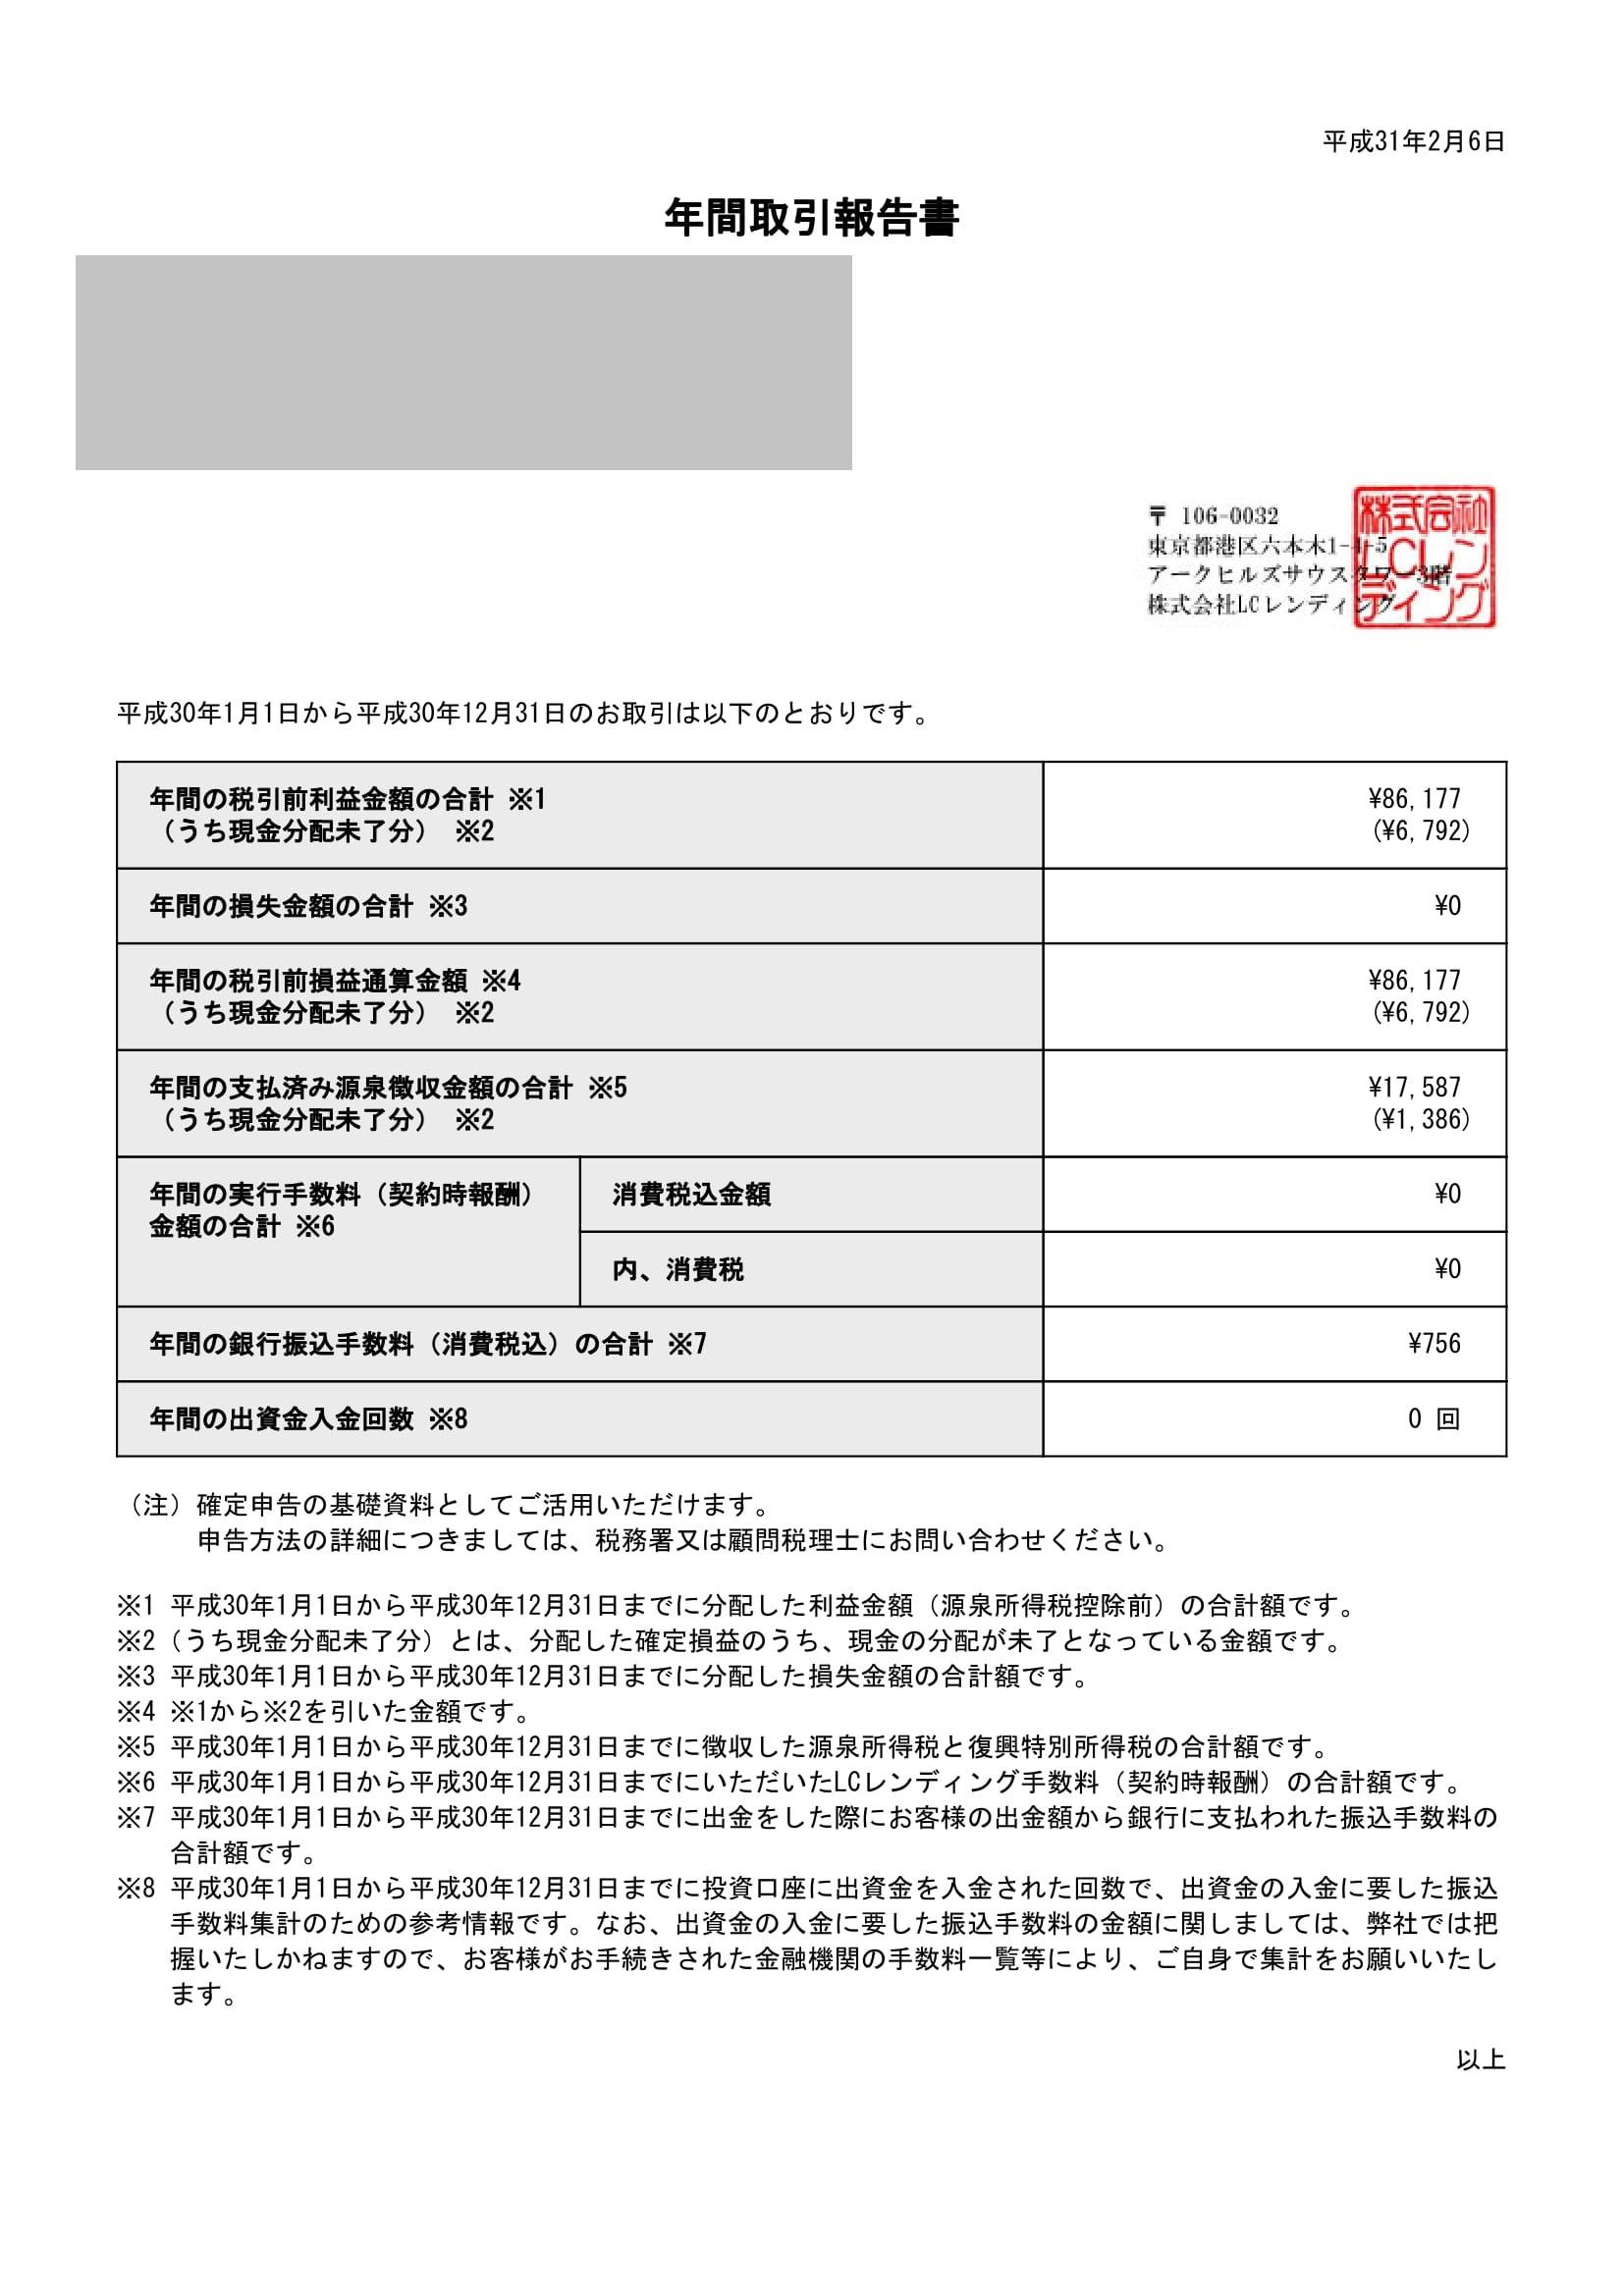 LCLENDING年間取引報告書_353_20190206-1